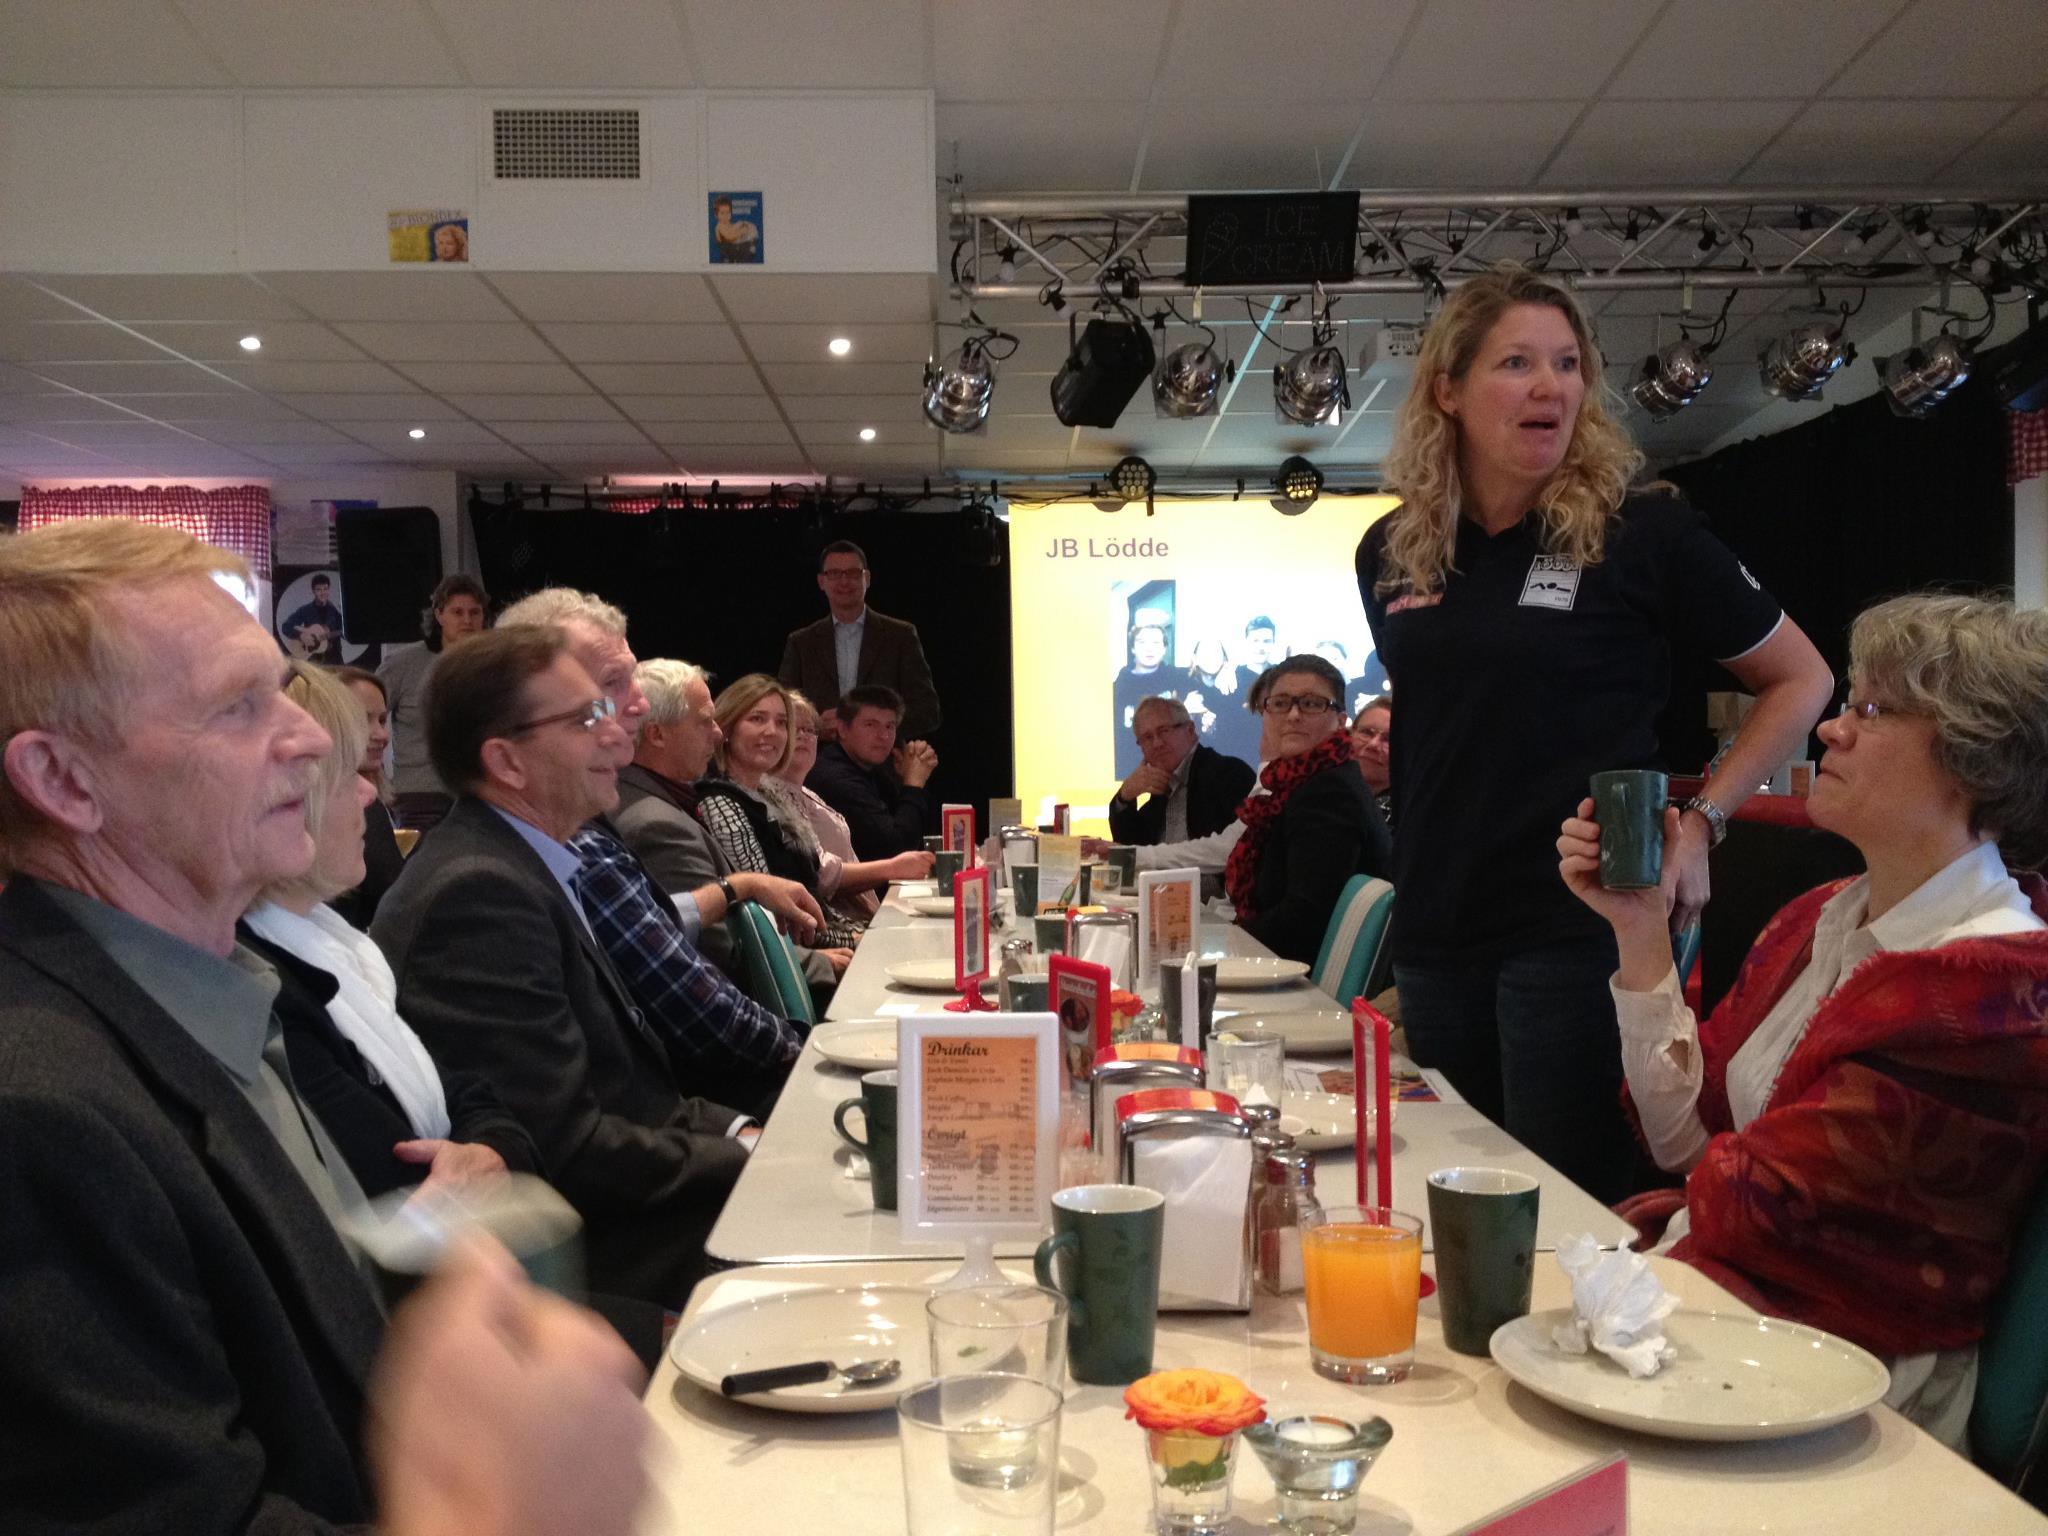 Näringslivsfrukost Kävlinge 20121017 - Årets Företagare 2011